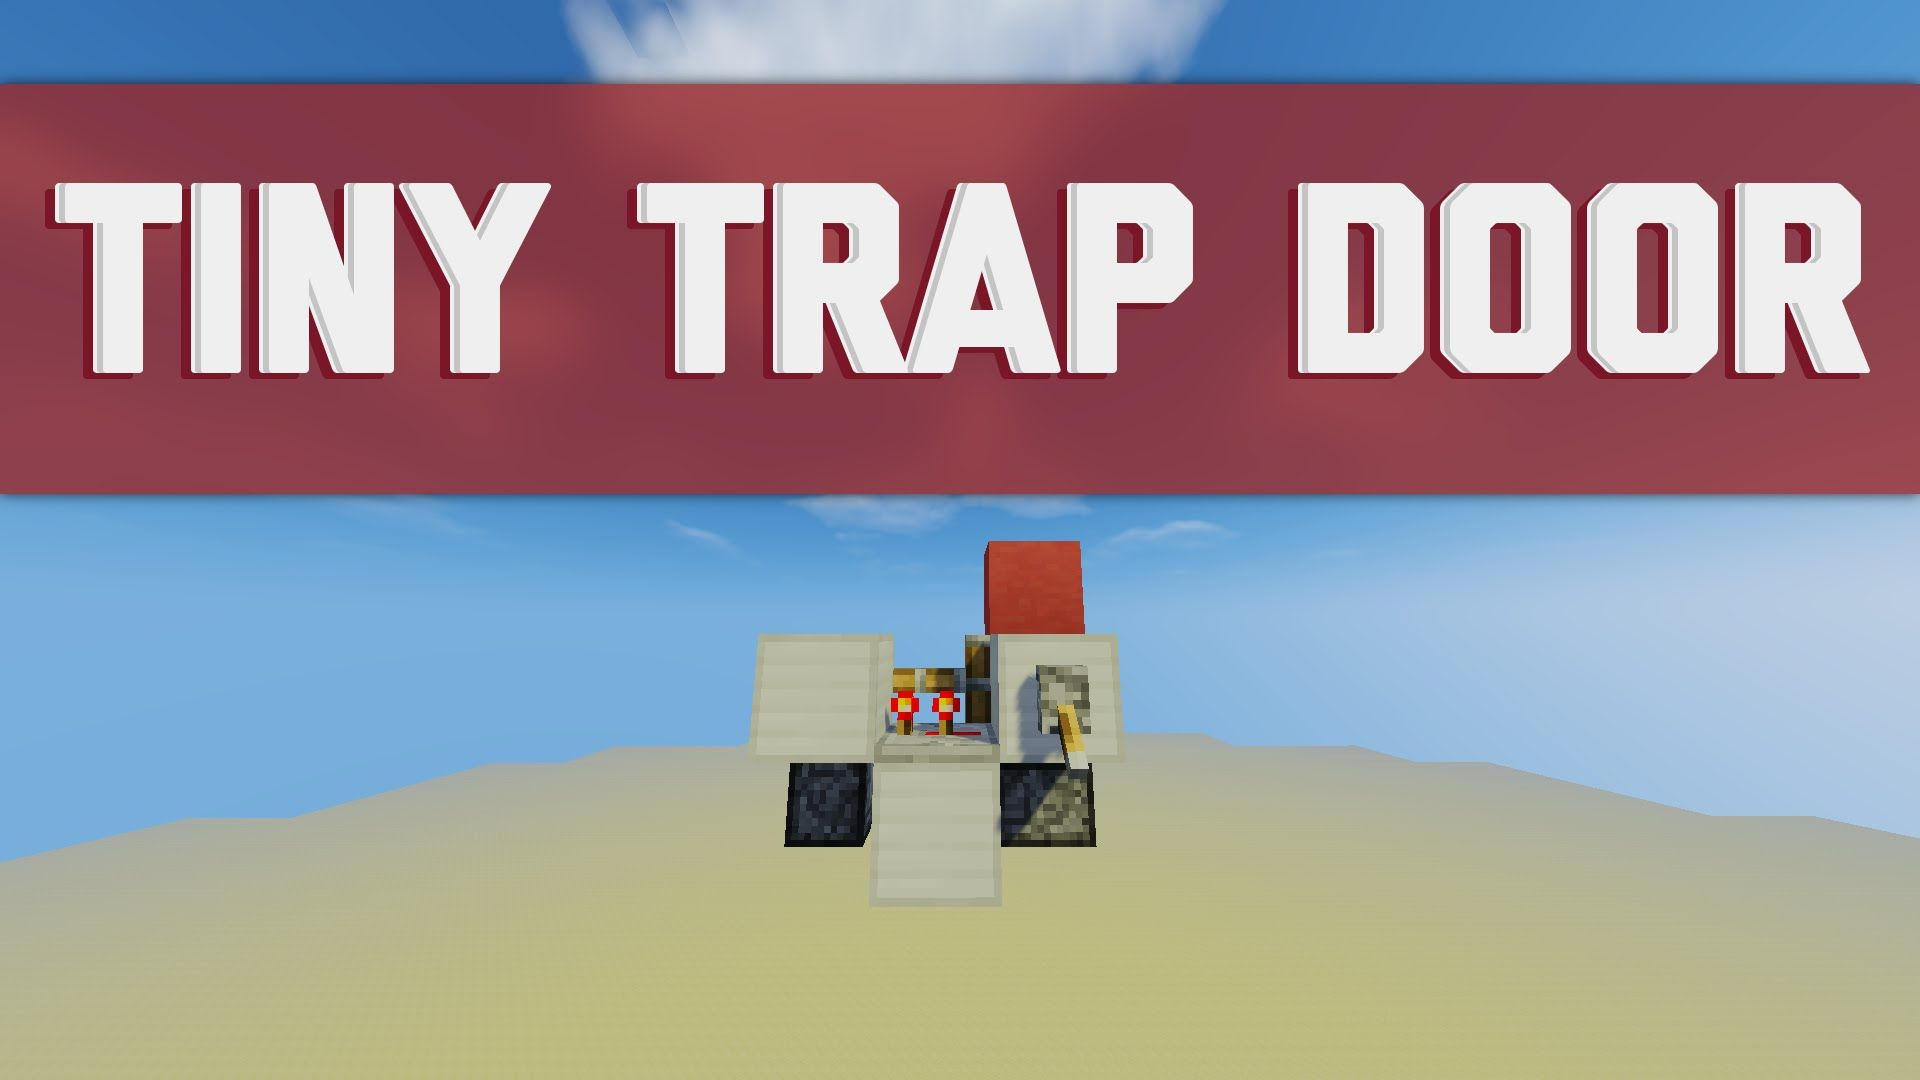 The Smallest Secret Trap Door In Minecraft 1x1 2x1 Or 2x2 Flush With Trap Door Minecraft Traps